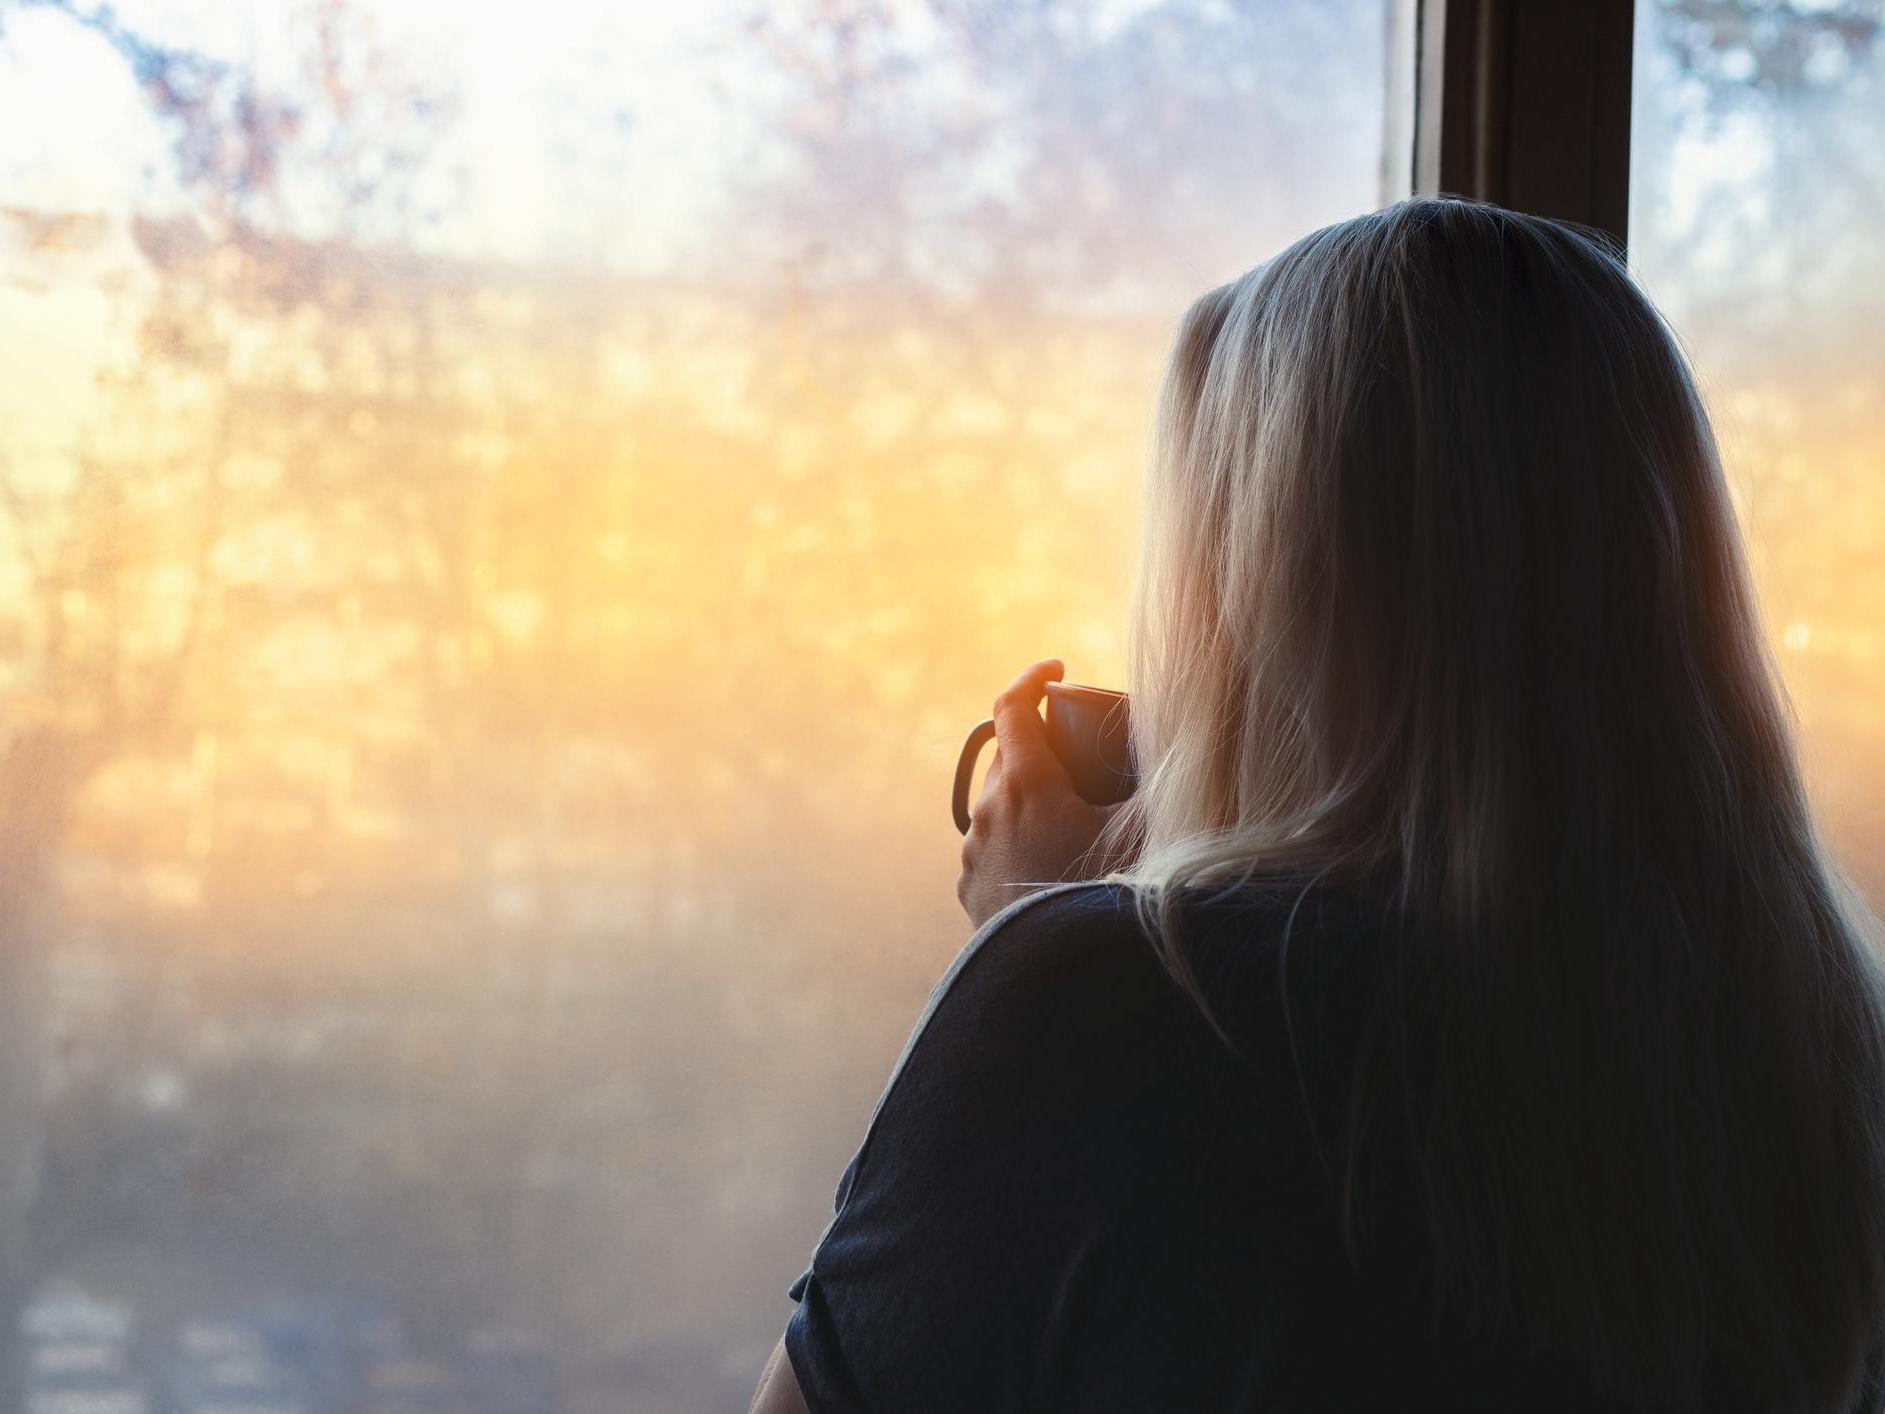 One in three women suffering from loneliness in lockdown